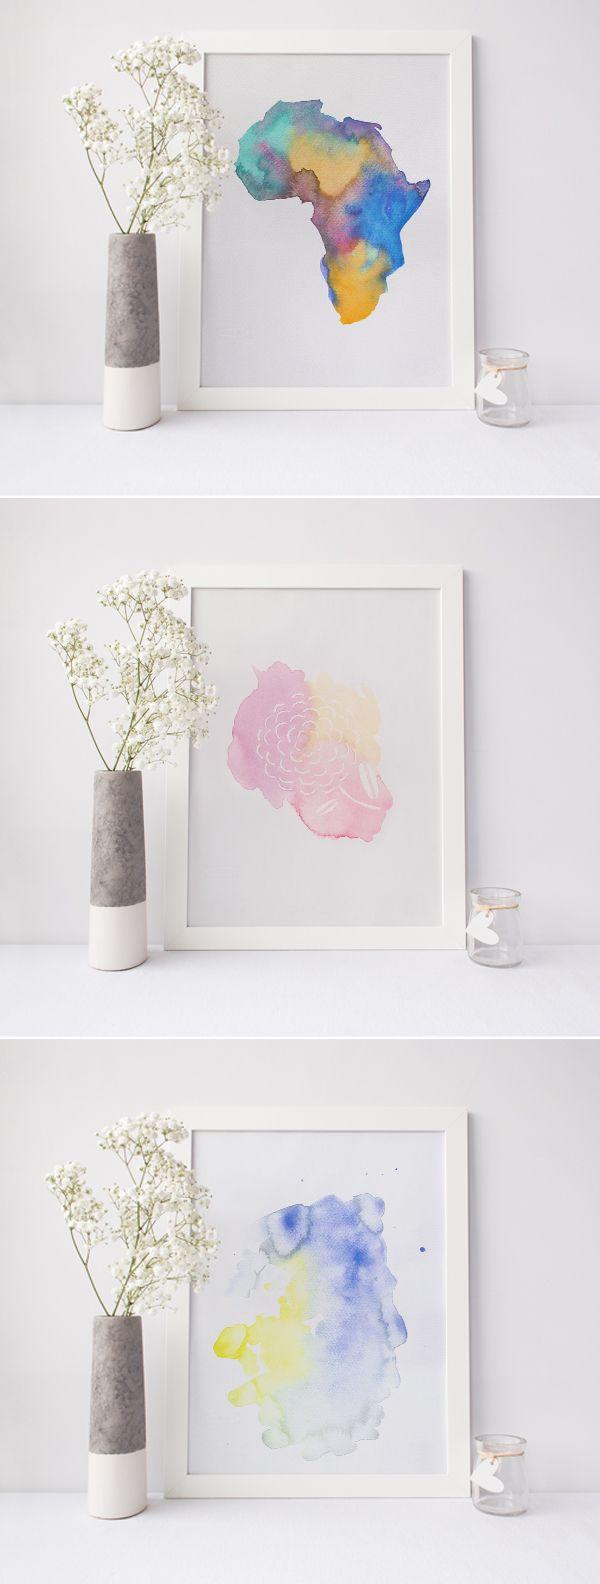 Wandgestaltung Aquarell / Afrika / Blume / Abstrakte Malerei / Deko / Etsyshop / Watercolor painting / Wall Decor